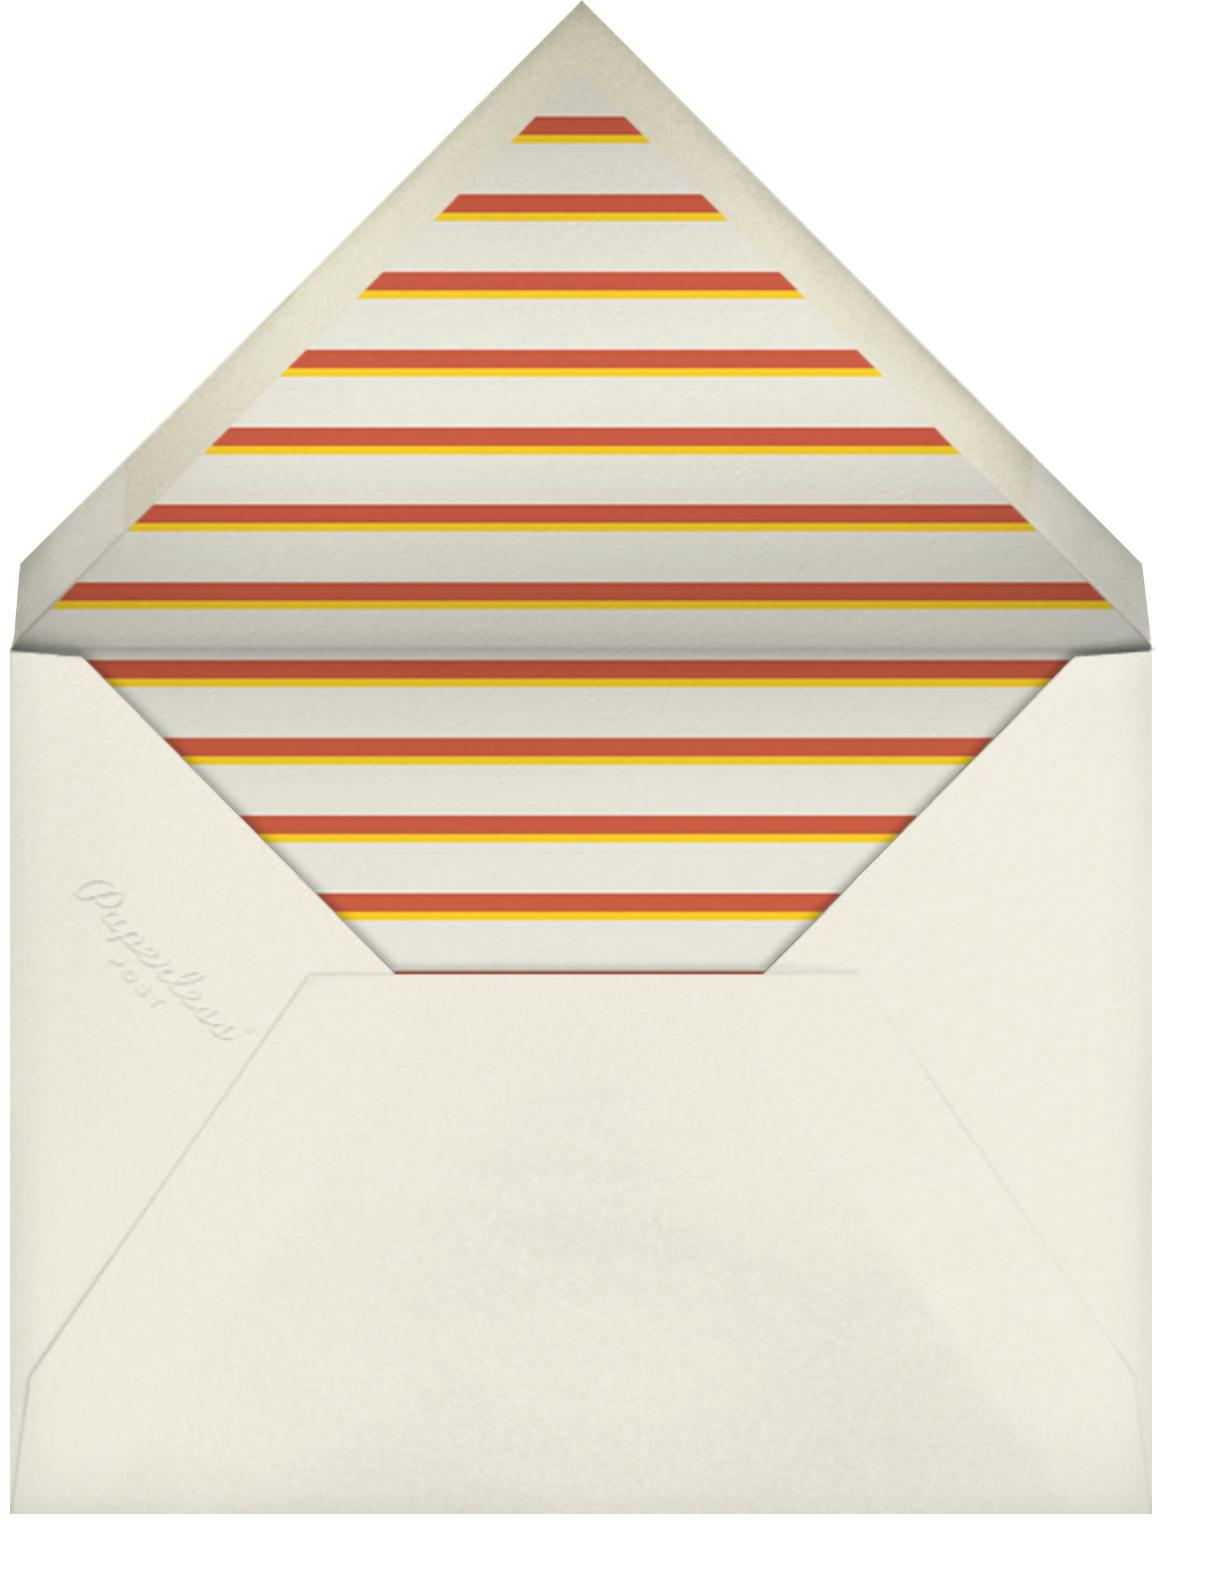 Olé Olé Olé - Paperless Post - Sorority events - envelope back